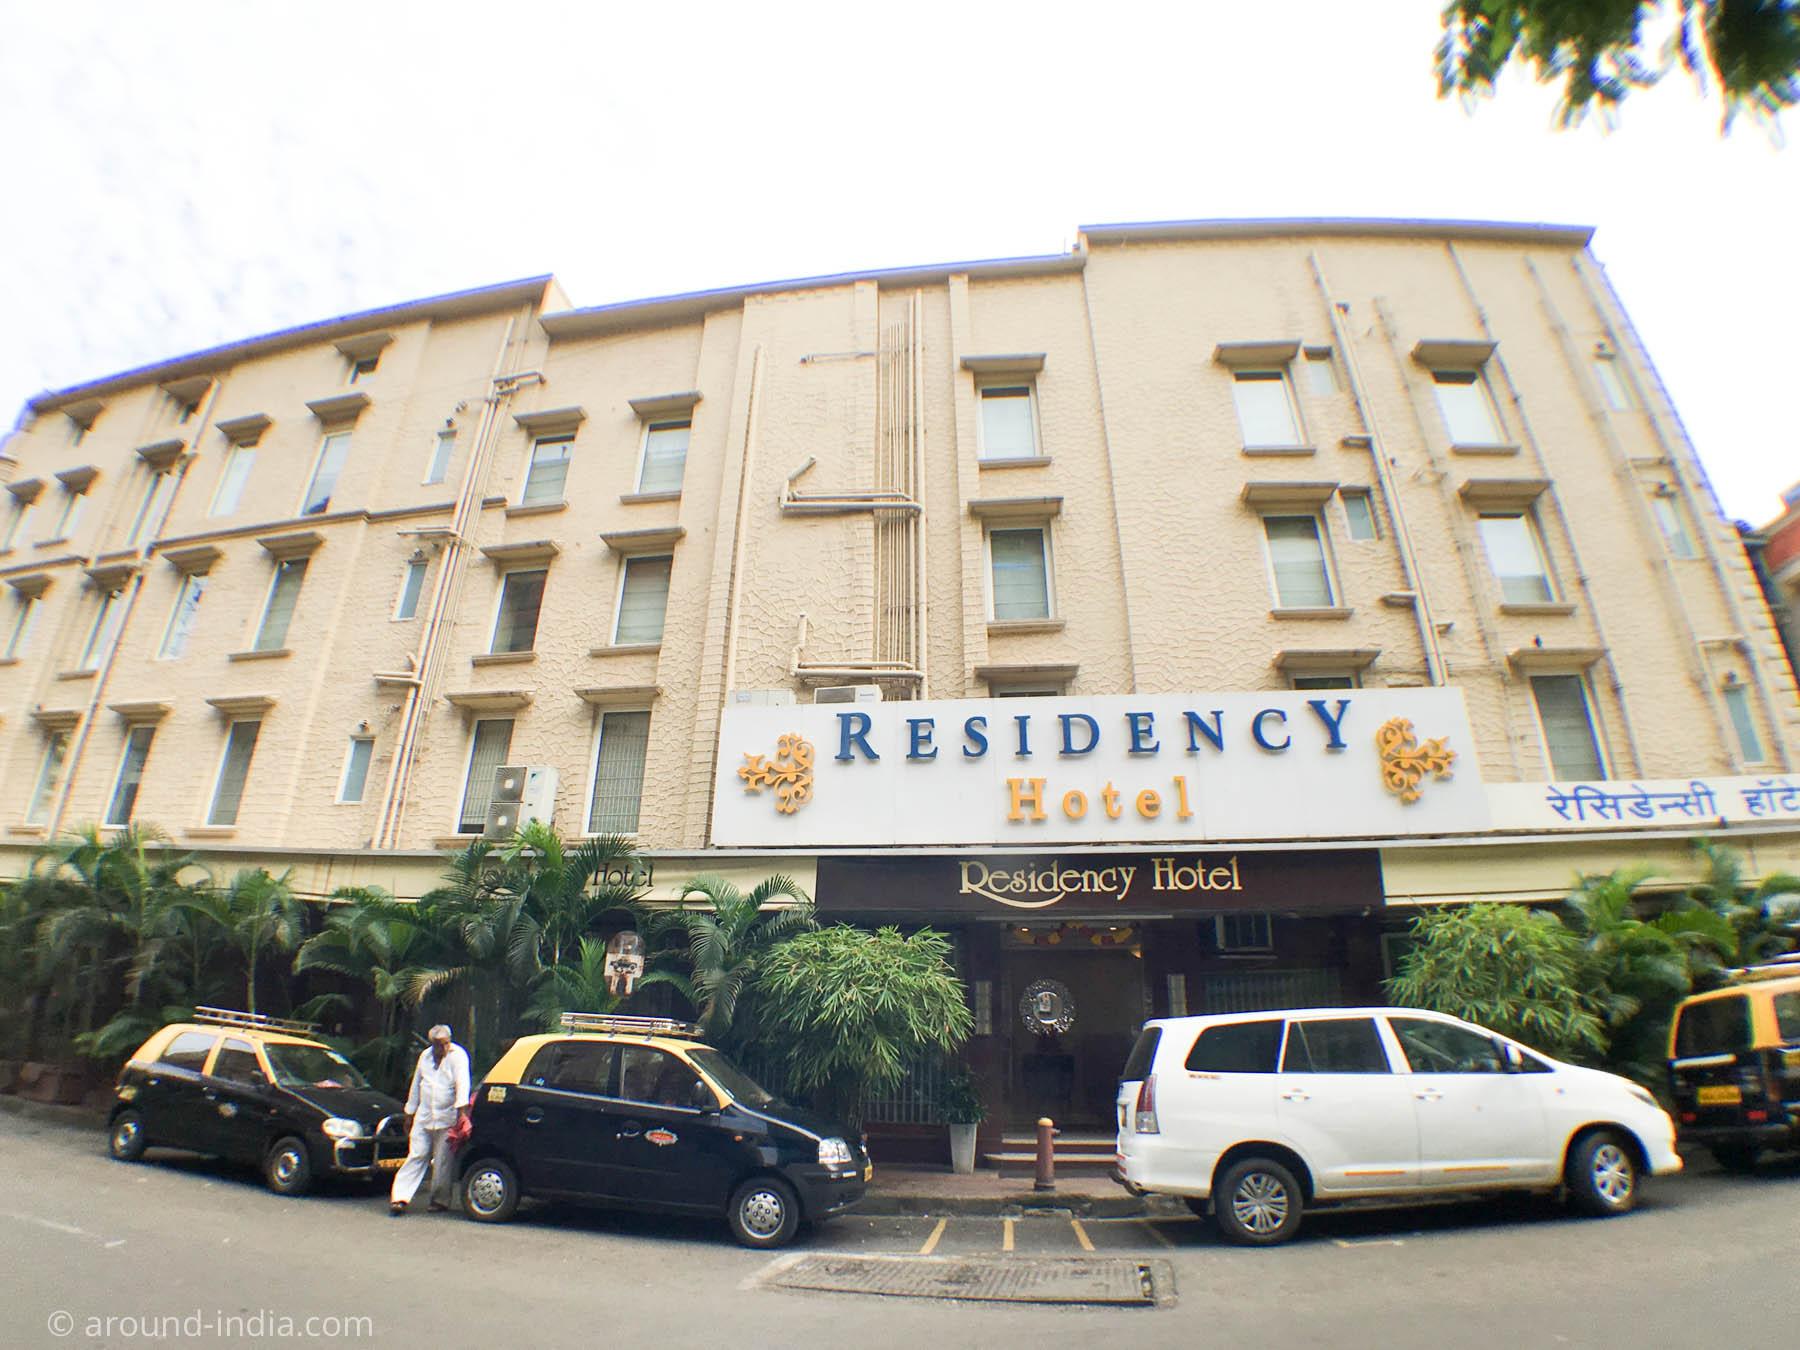 Residency Hotel Fortの外観